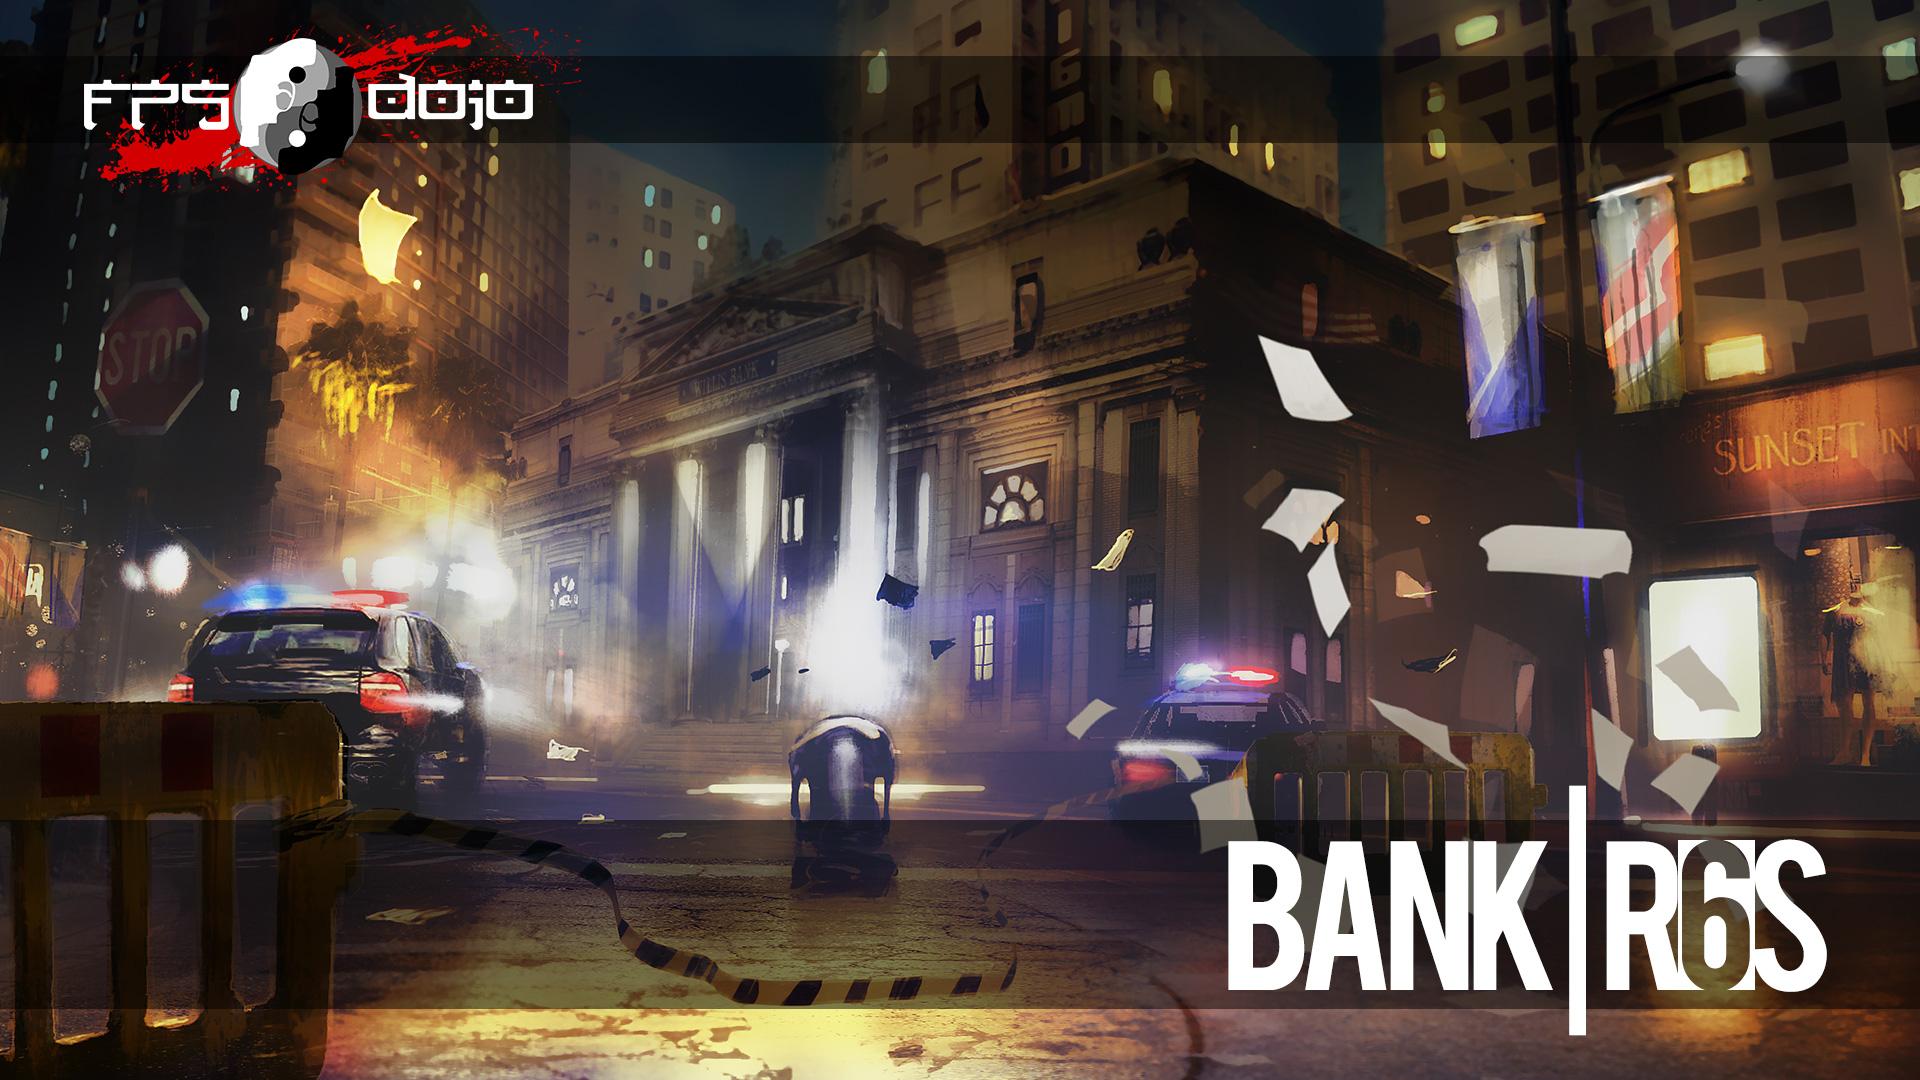 R6S: Bank